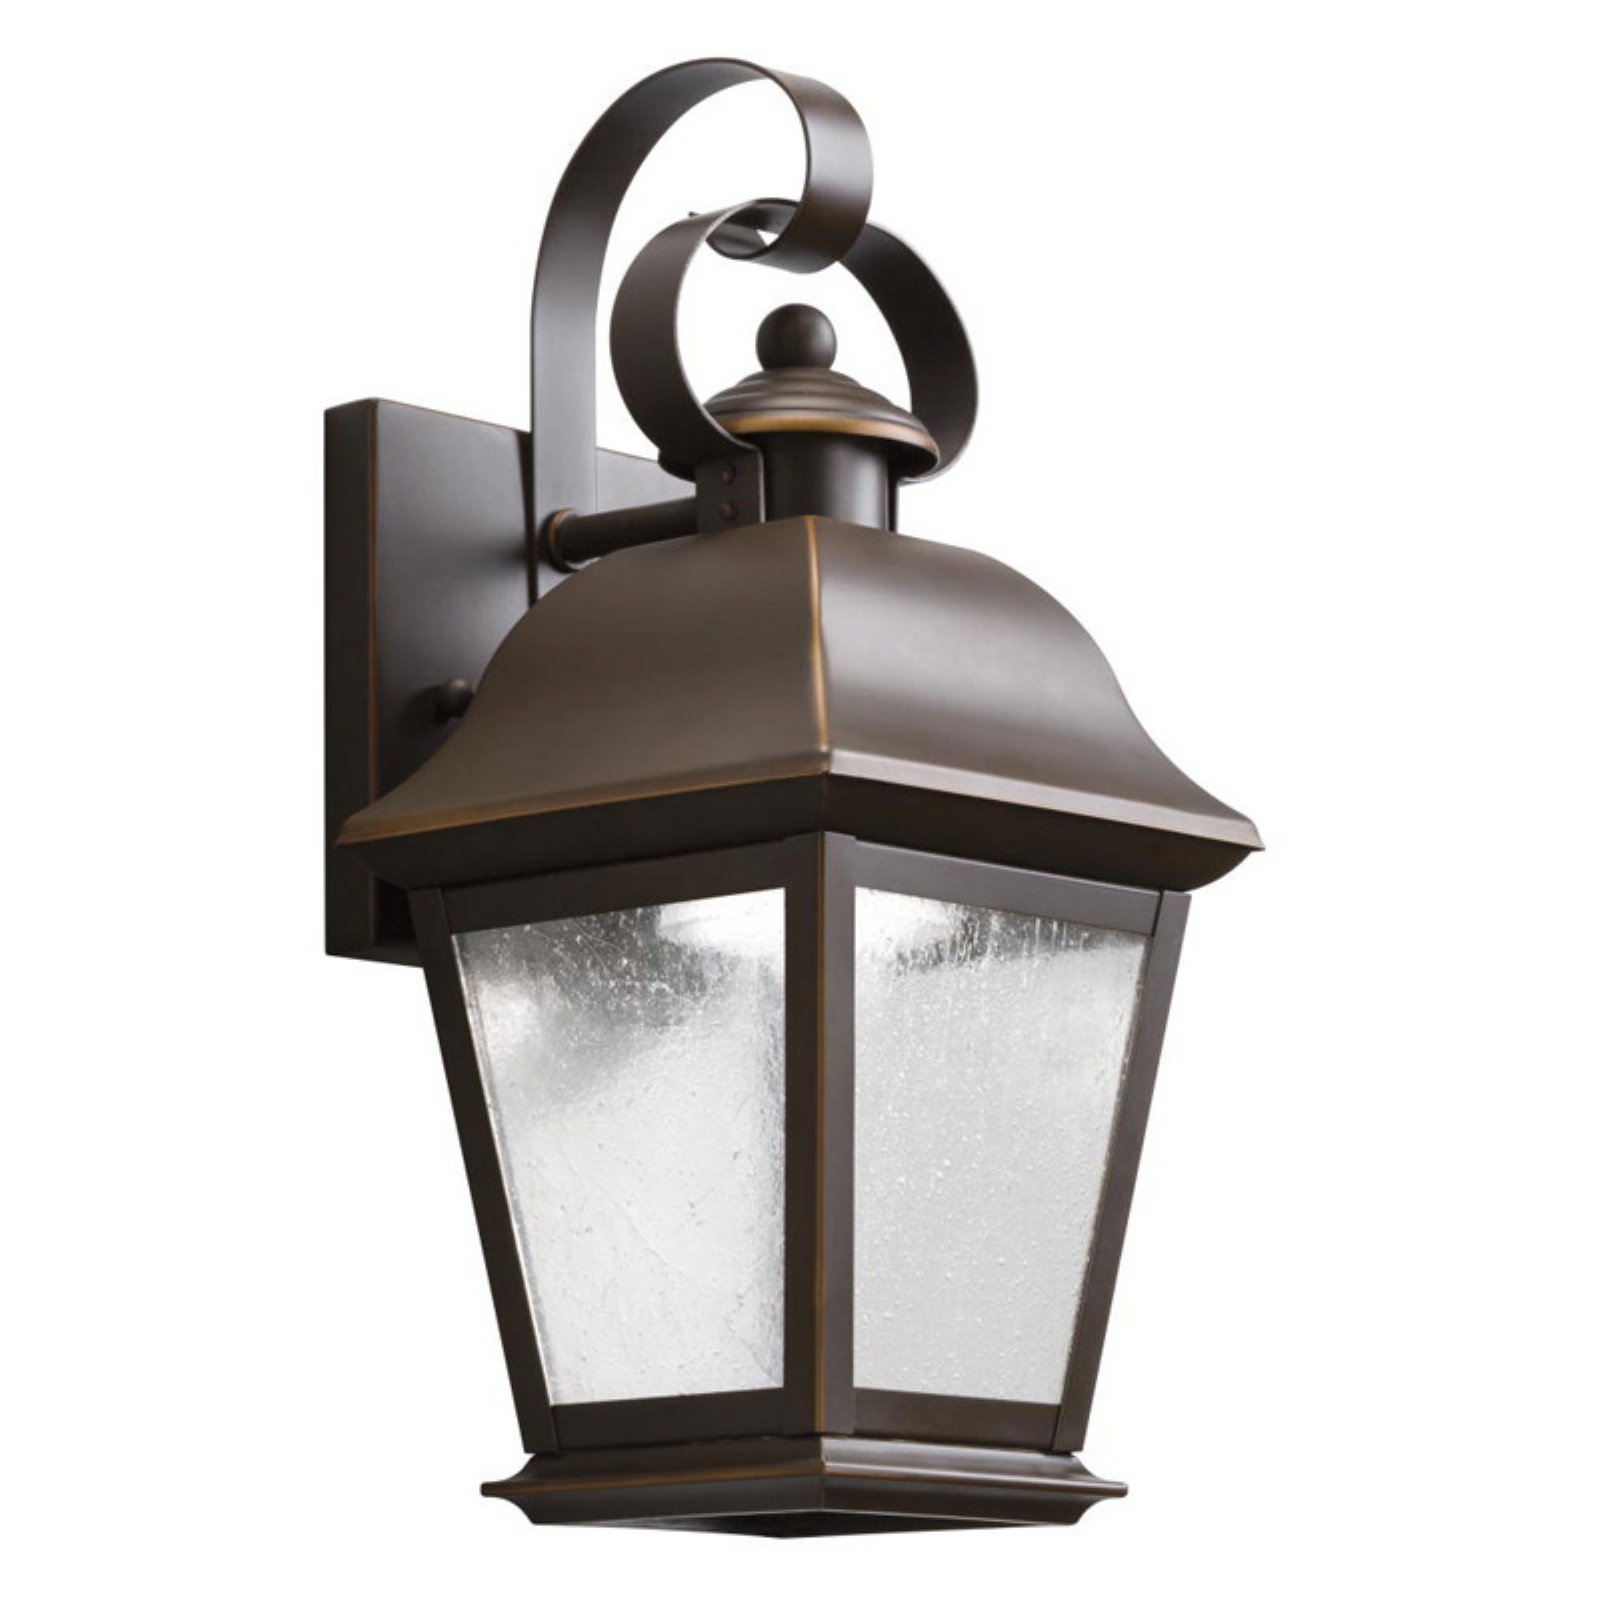 Kichler Mount Vernon 970 Outdoor Wall Lantern